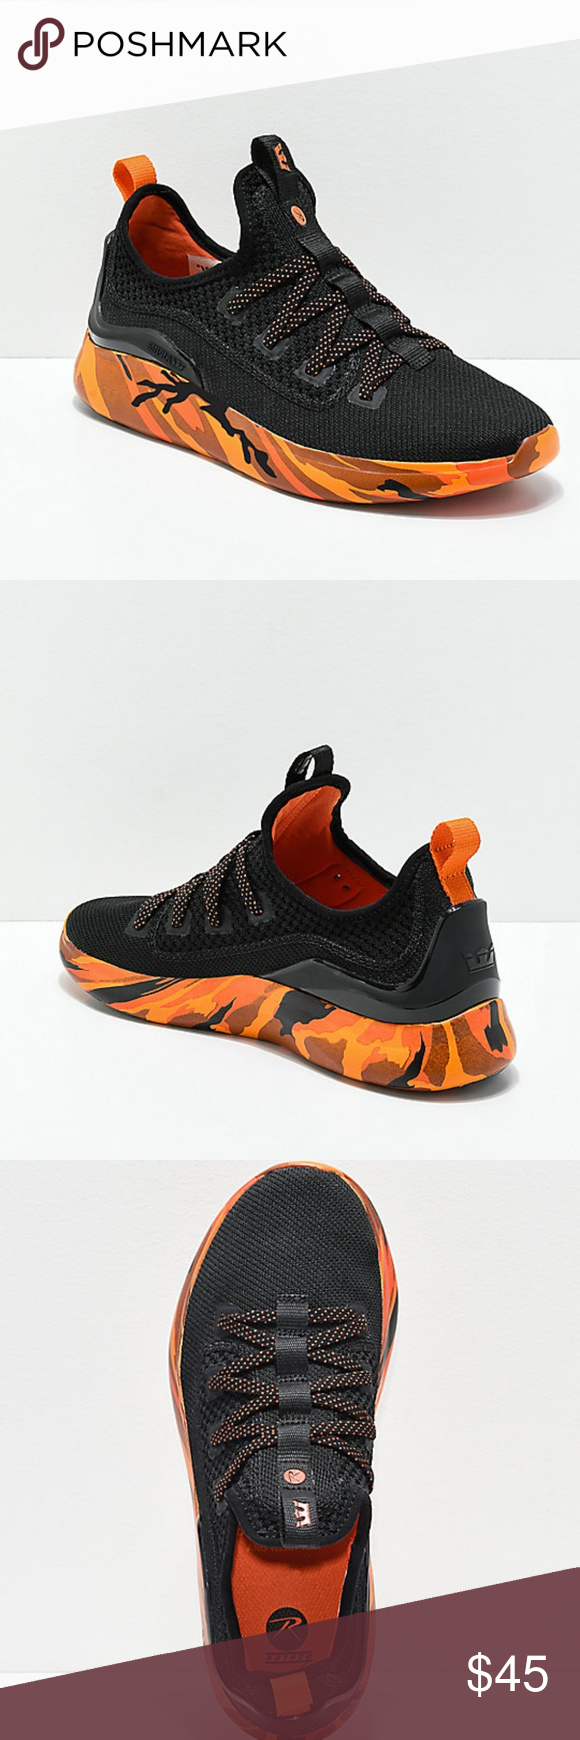 d2c41dfb8db Supra x Rothco Factor Black & Savage Orange Shoes New Supra x Rothco Factor  Black & Savage Orange Camo Shoes Men's Sz 8.5 Factor Black & Savage Orange  Camo ...